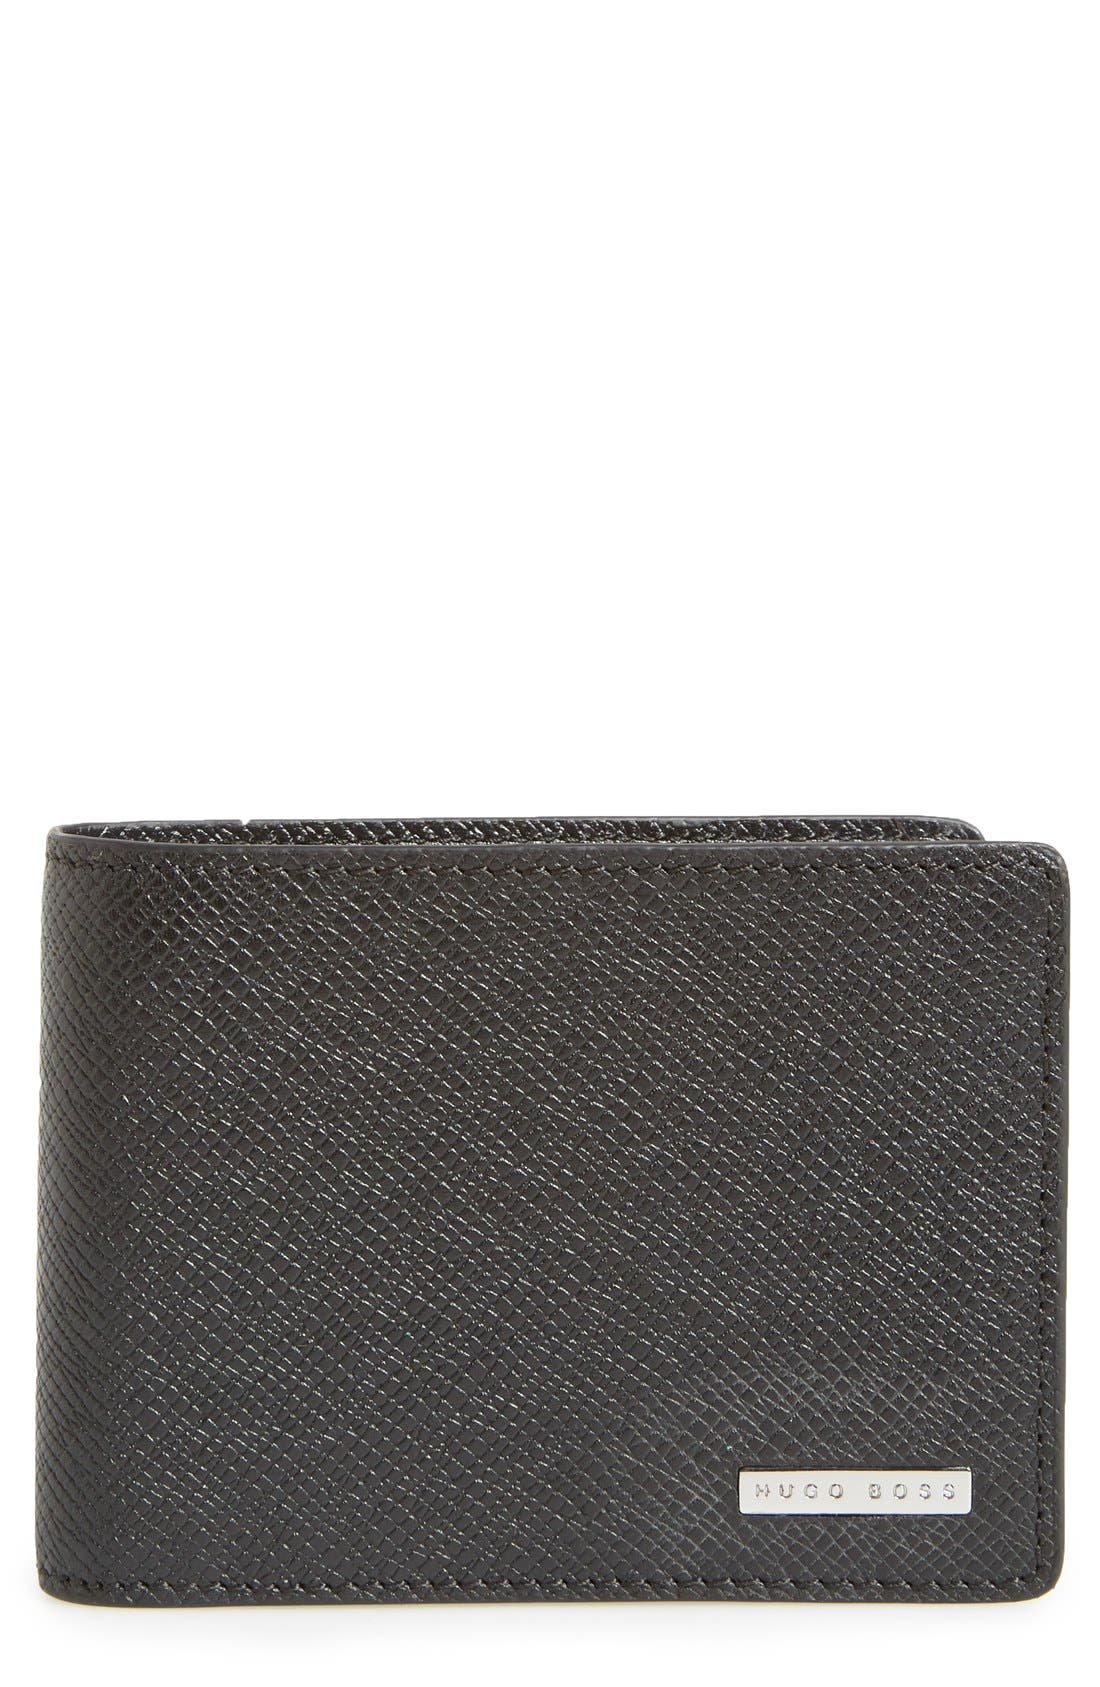 Main Image - BOSS 'Signature' Bifold Calfskin Leather Wallet